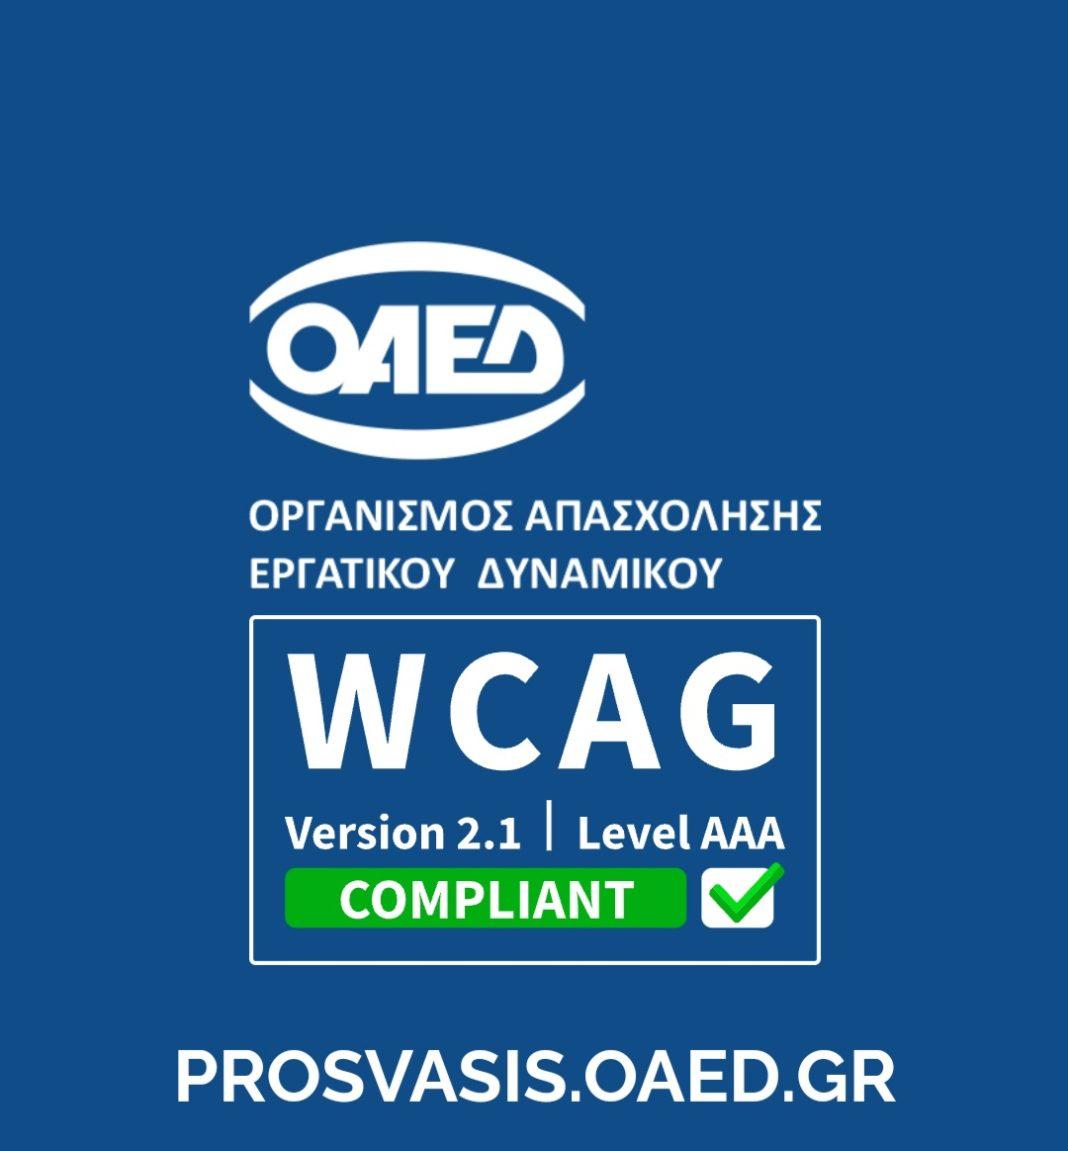 prosvasis oaed